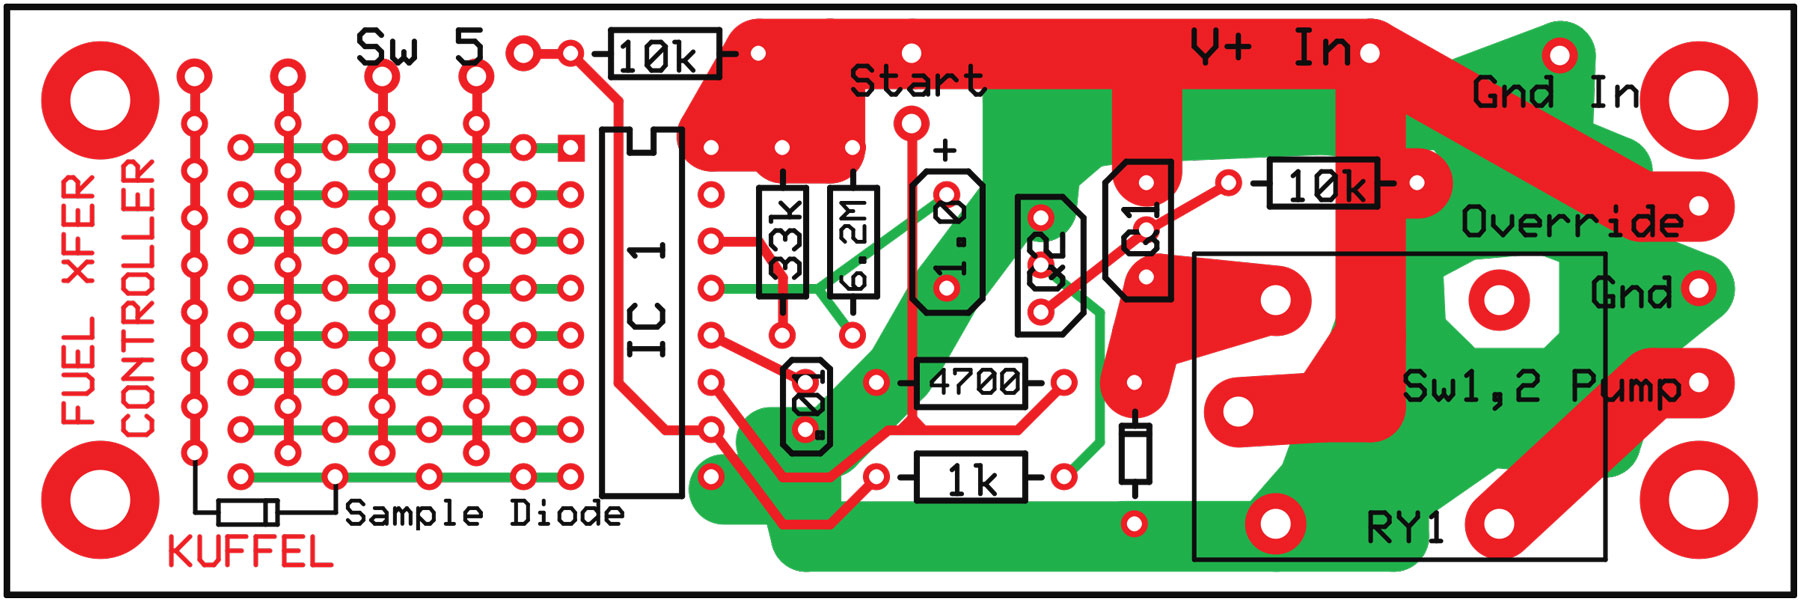 Figure 3. Board layout, Digital TDR Fuel Transfer Controller